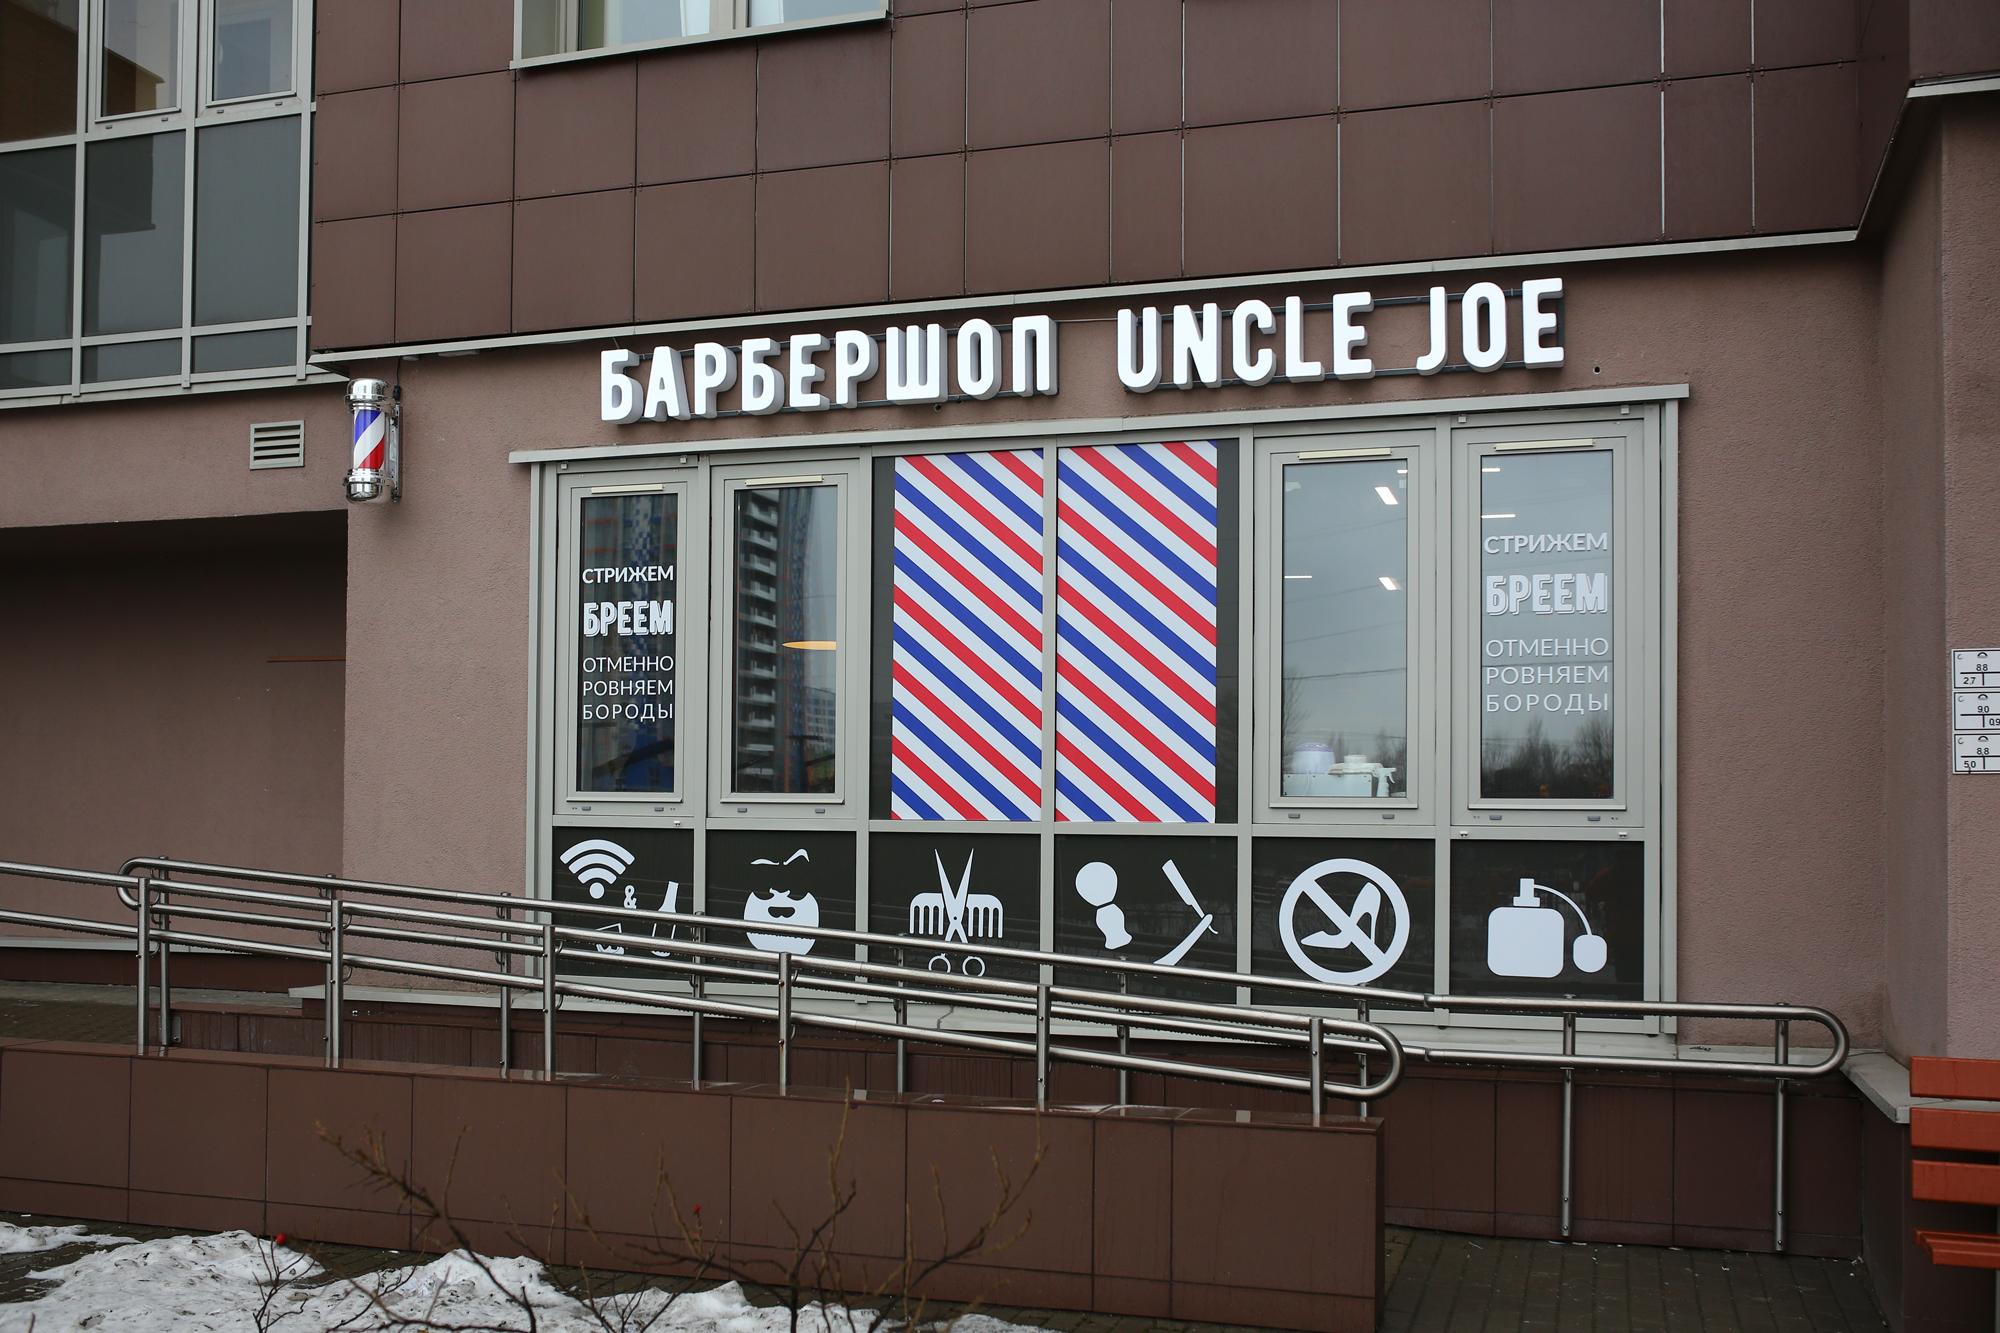 Освещение Barbershop Uncle Joe